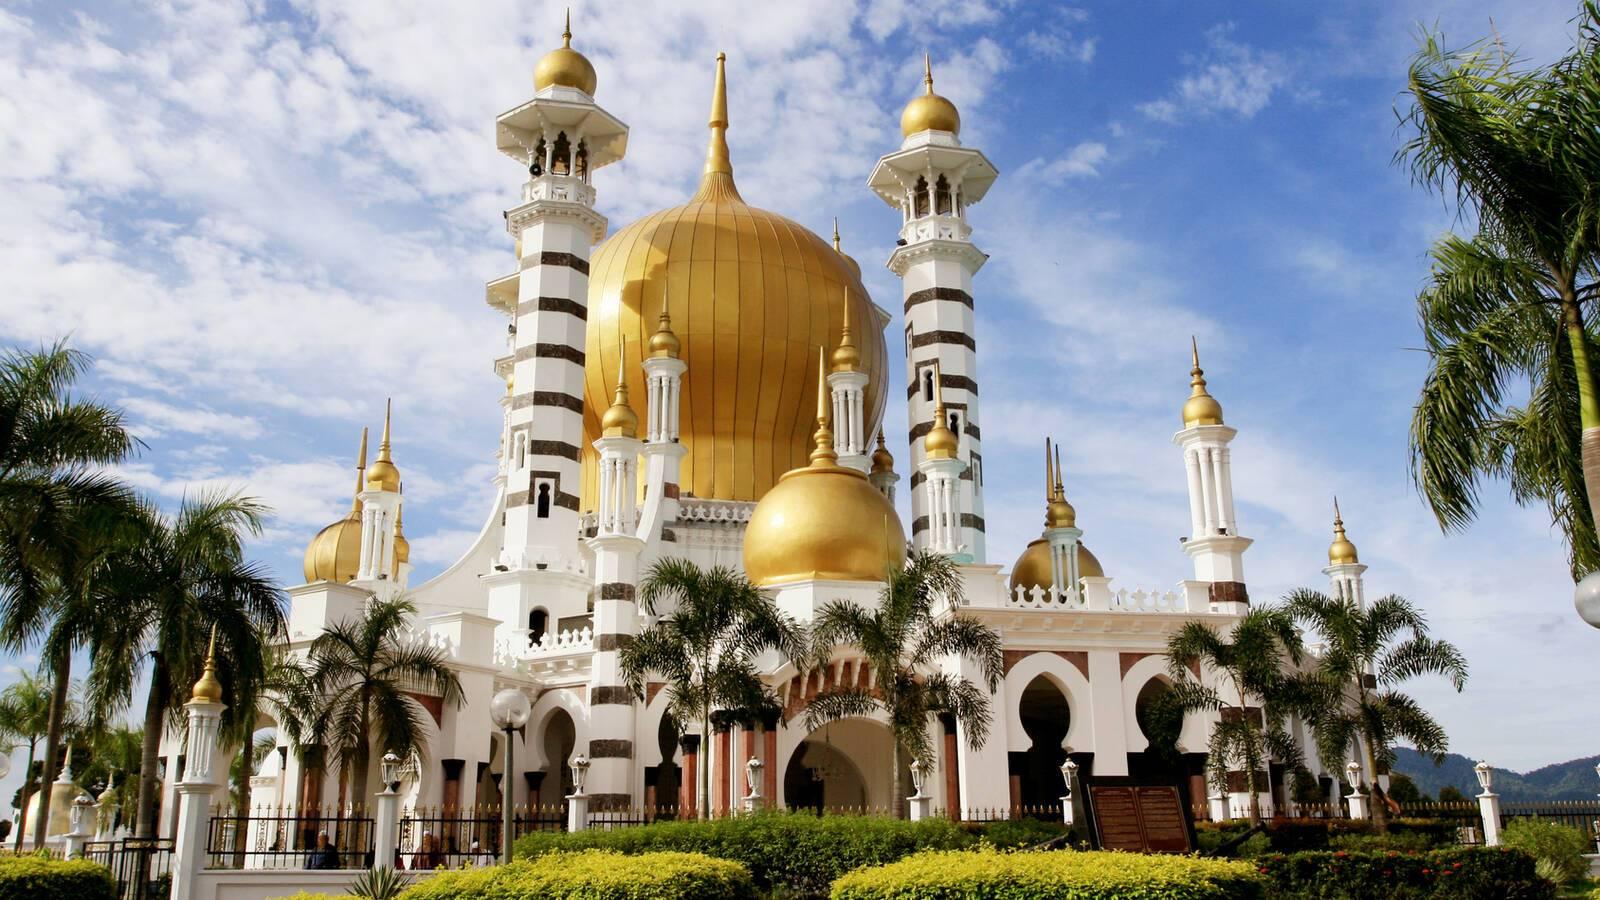 Mosquee Ubudiah AkmalRahim